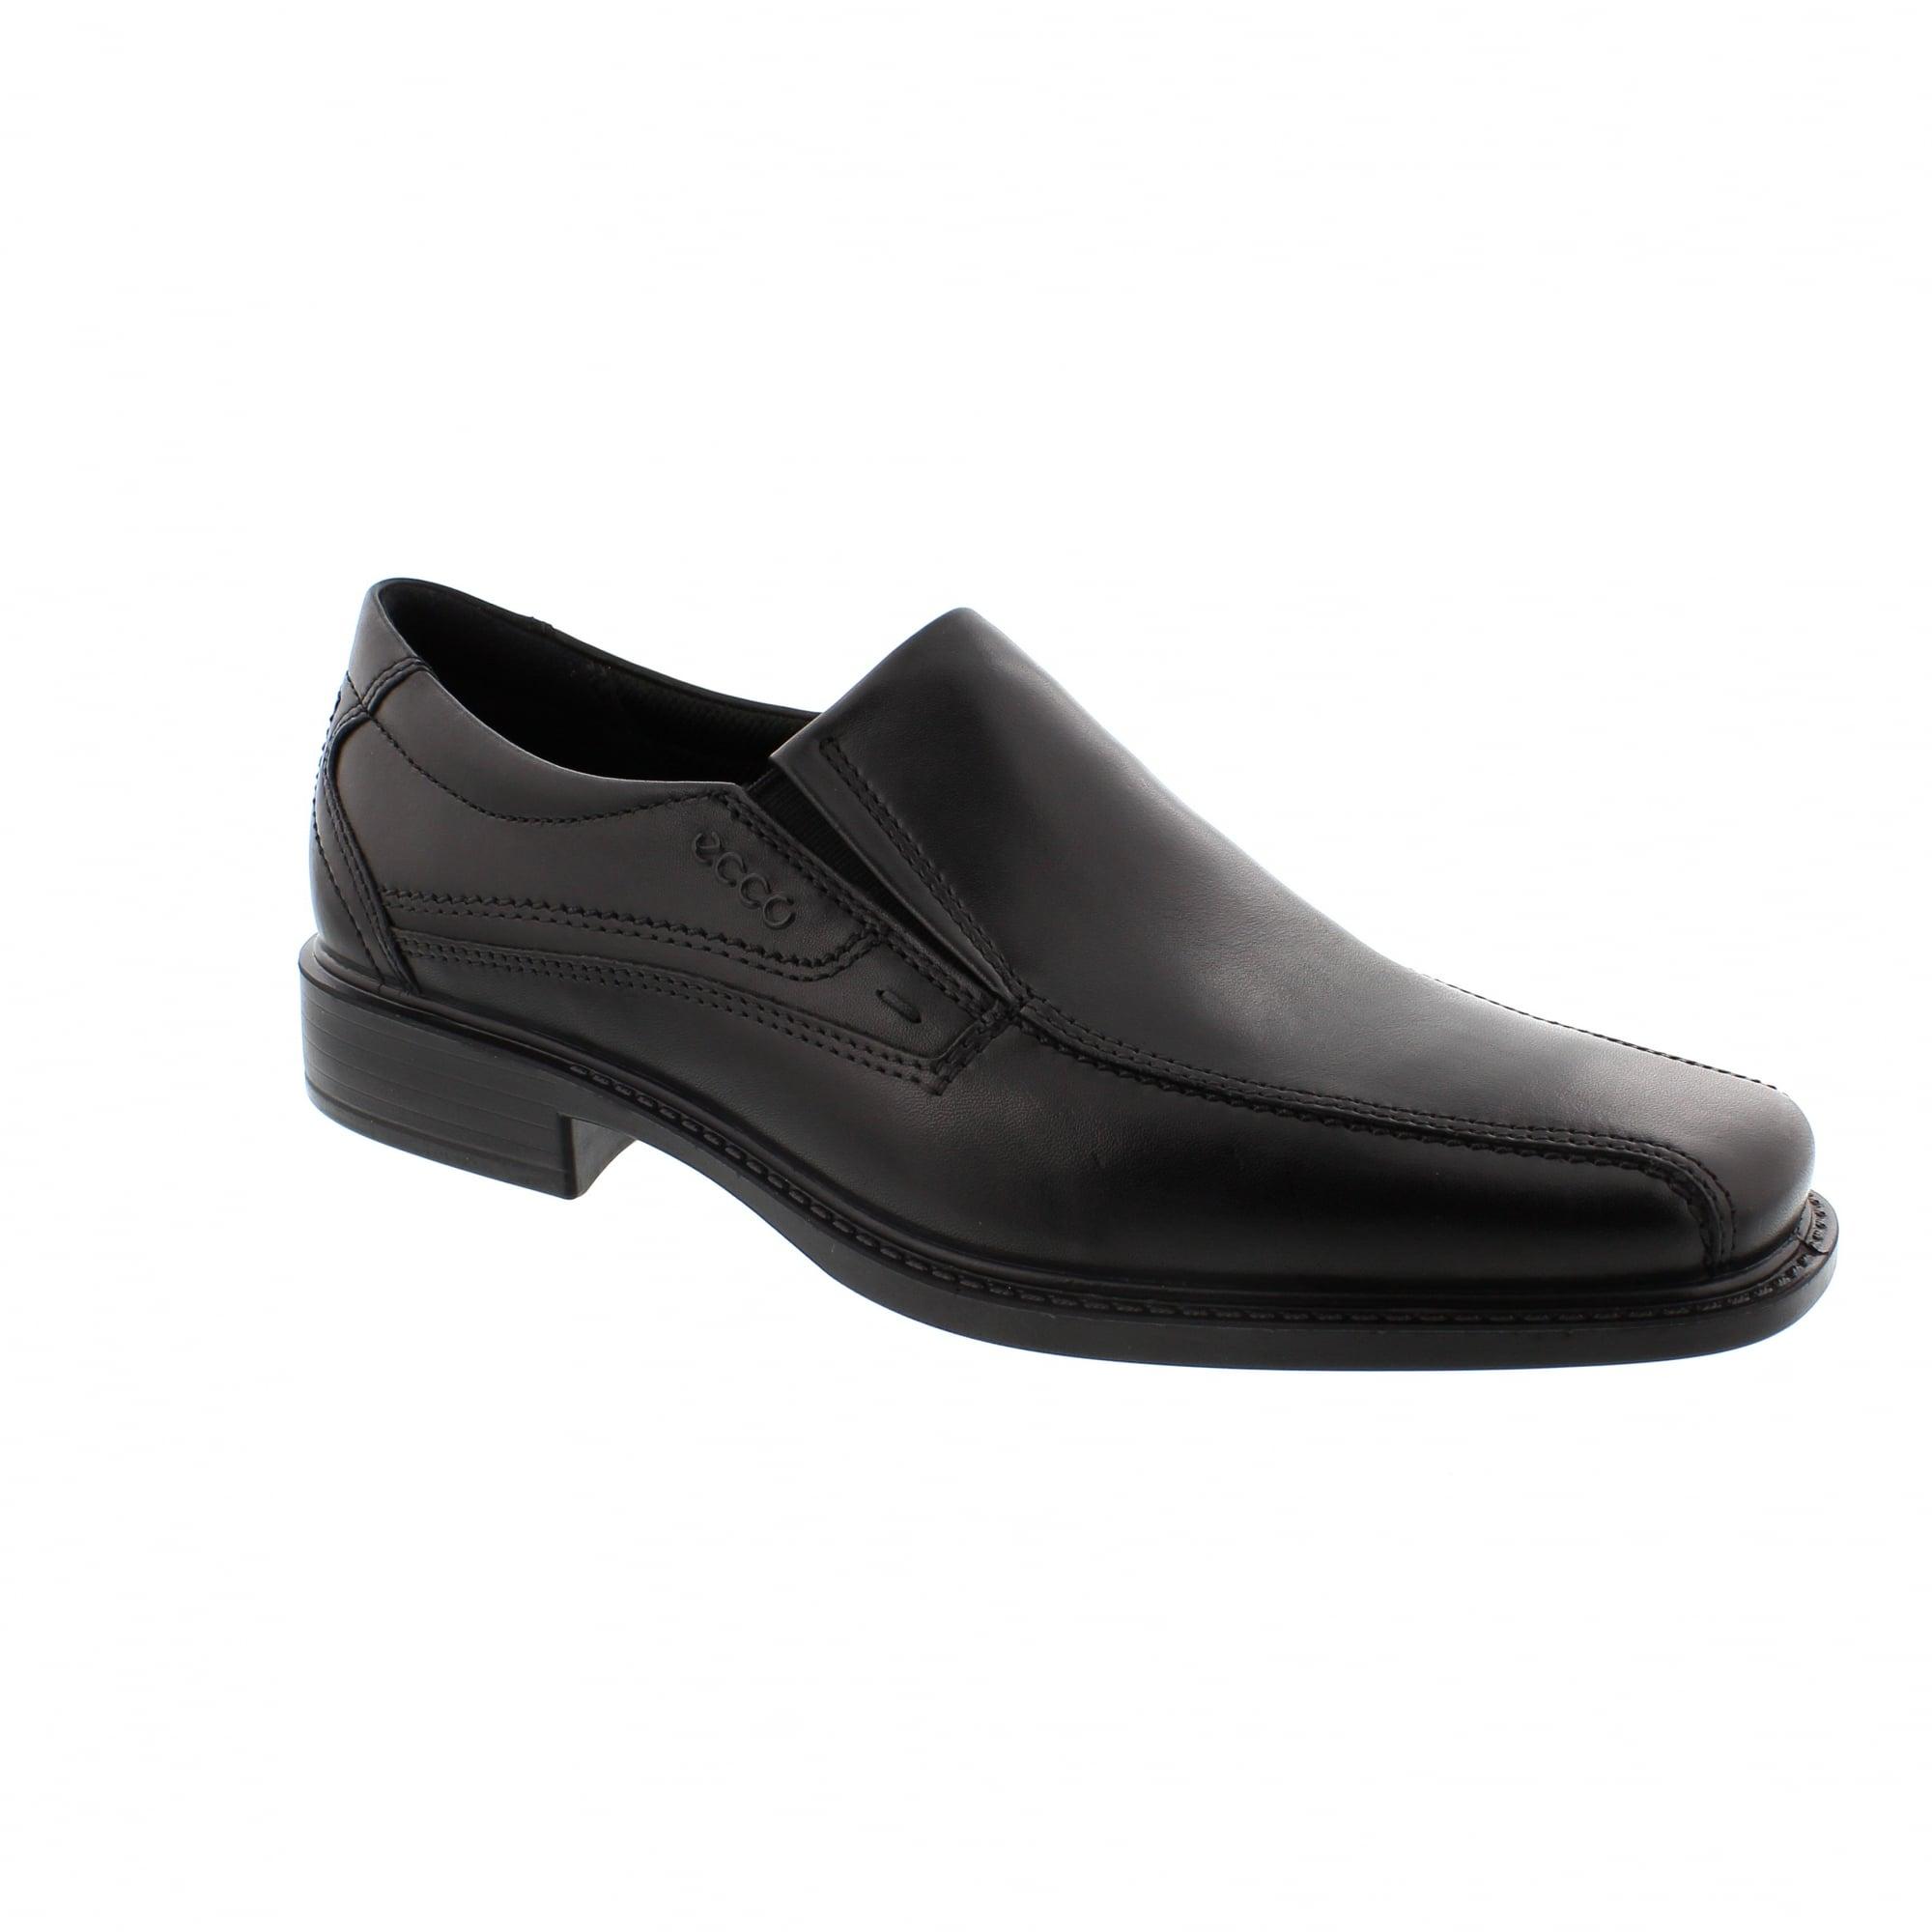 917c23381e00 Ecco New Jersey 051504-01001 Mens Slip On Shoes